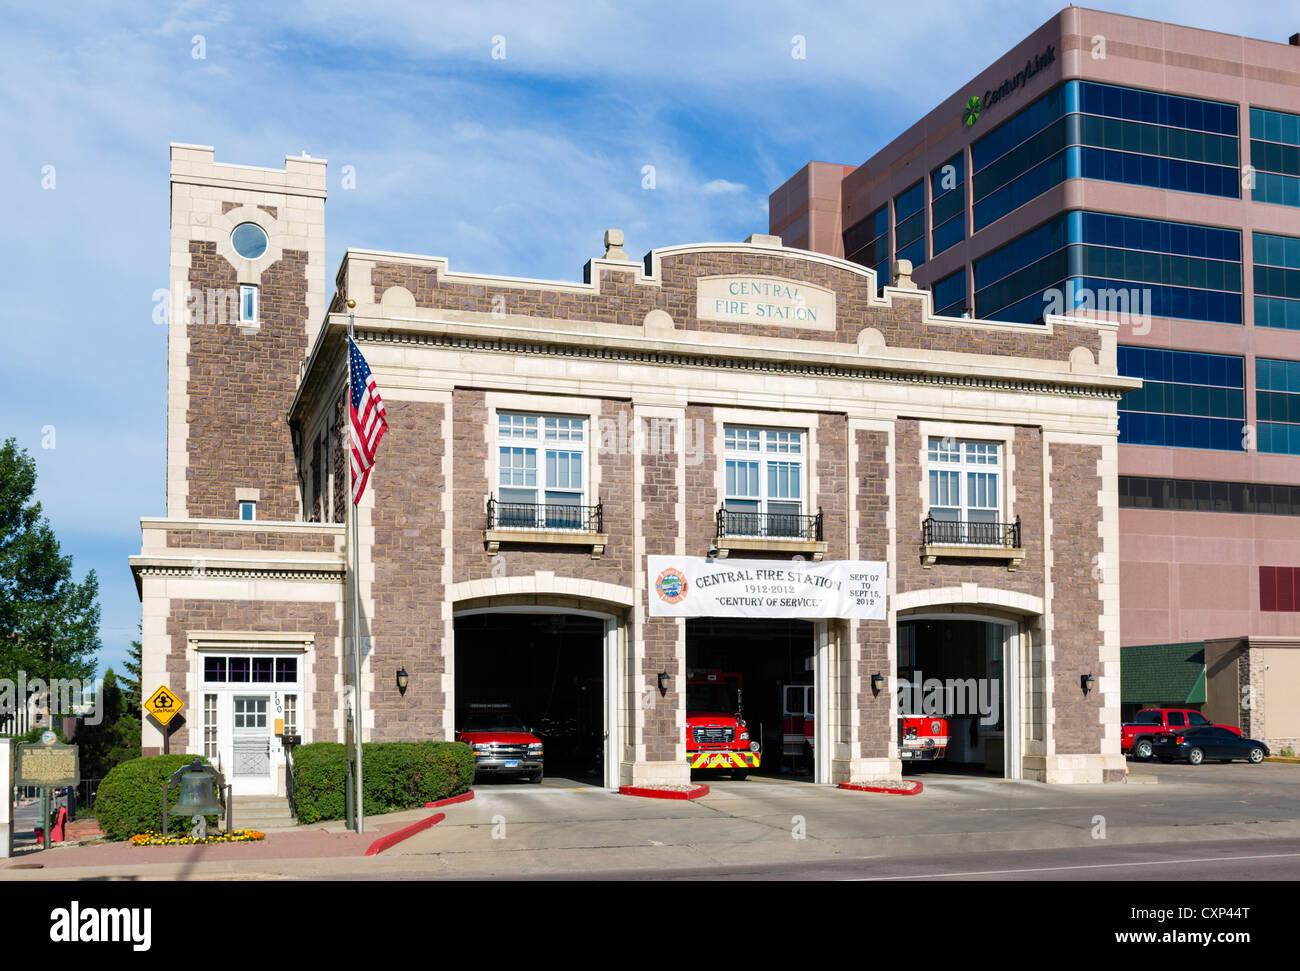 The Central Fire Station on South Minnesota Aveneu, Sioux Falls, South Dakota, USA - Stock Image